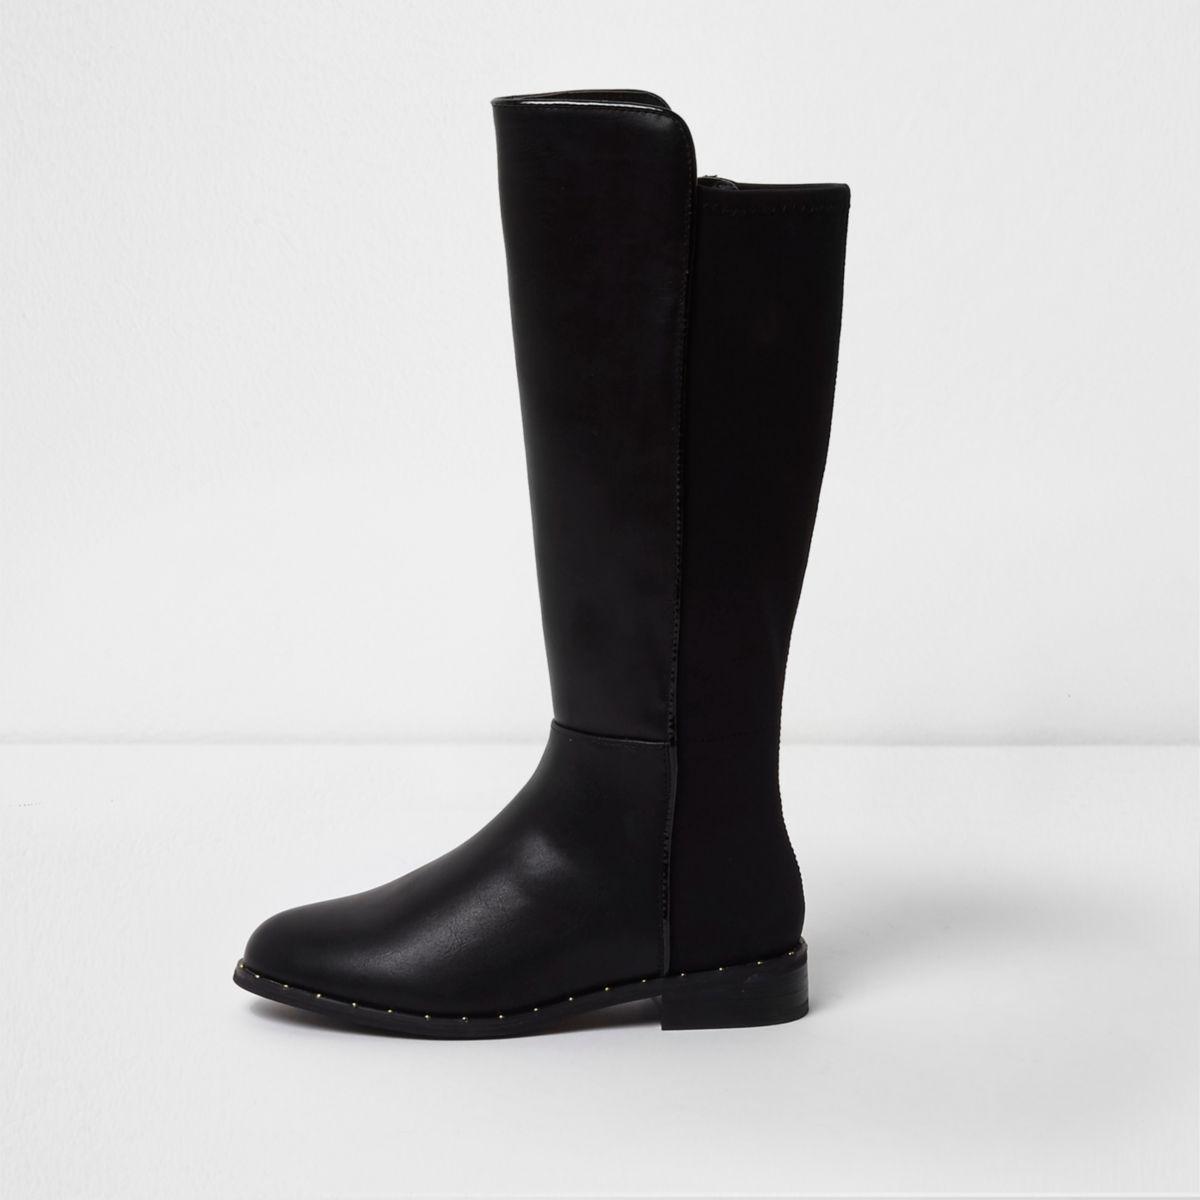 Girls black knee high flat riding boots